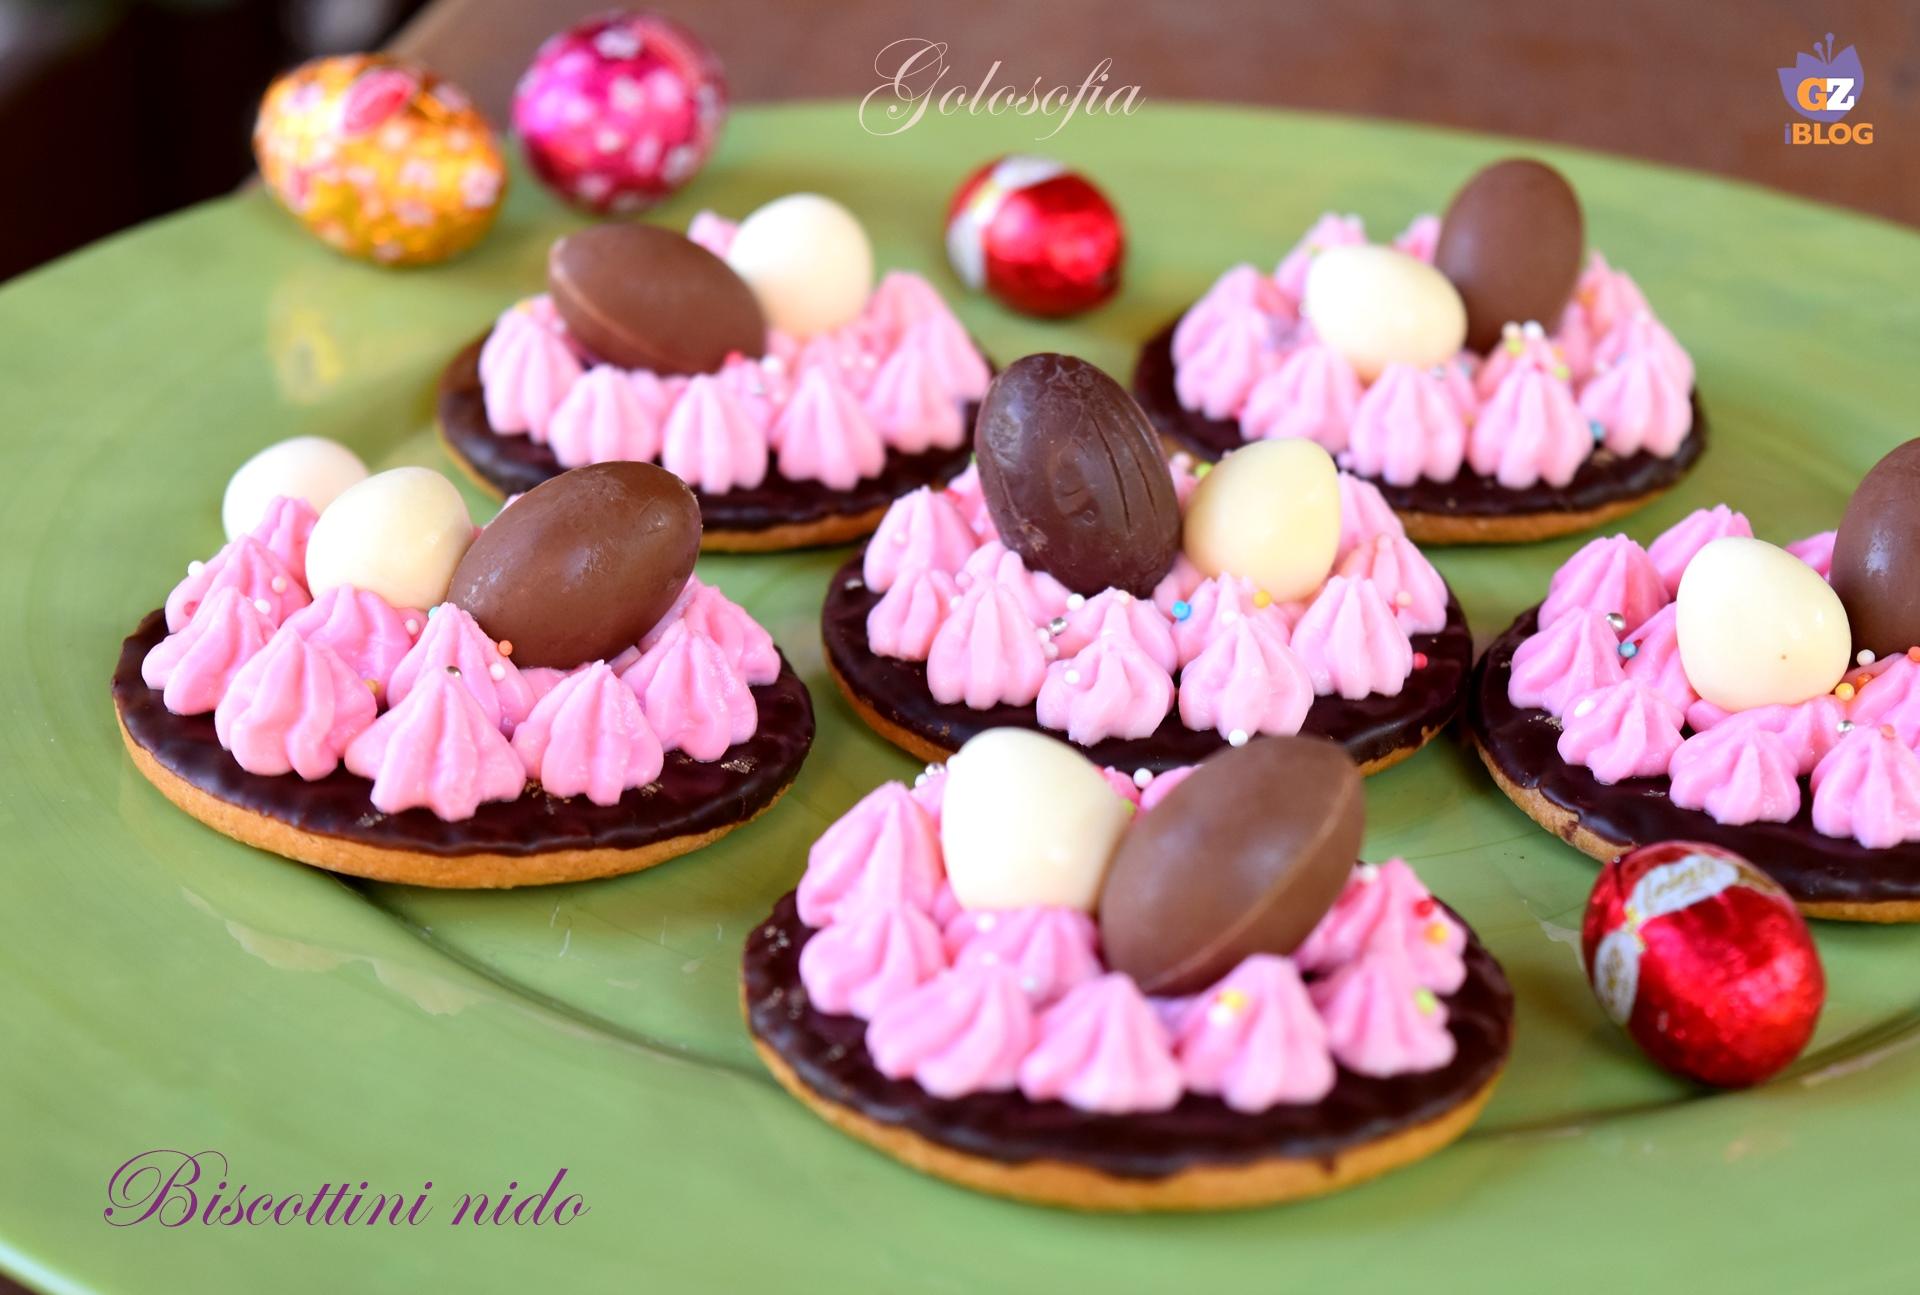 Biscottini nido-ricetta biscotti-golosofia